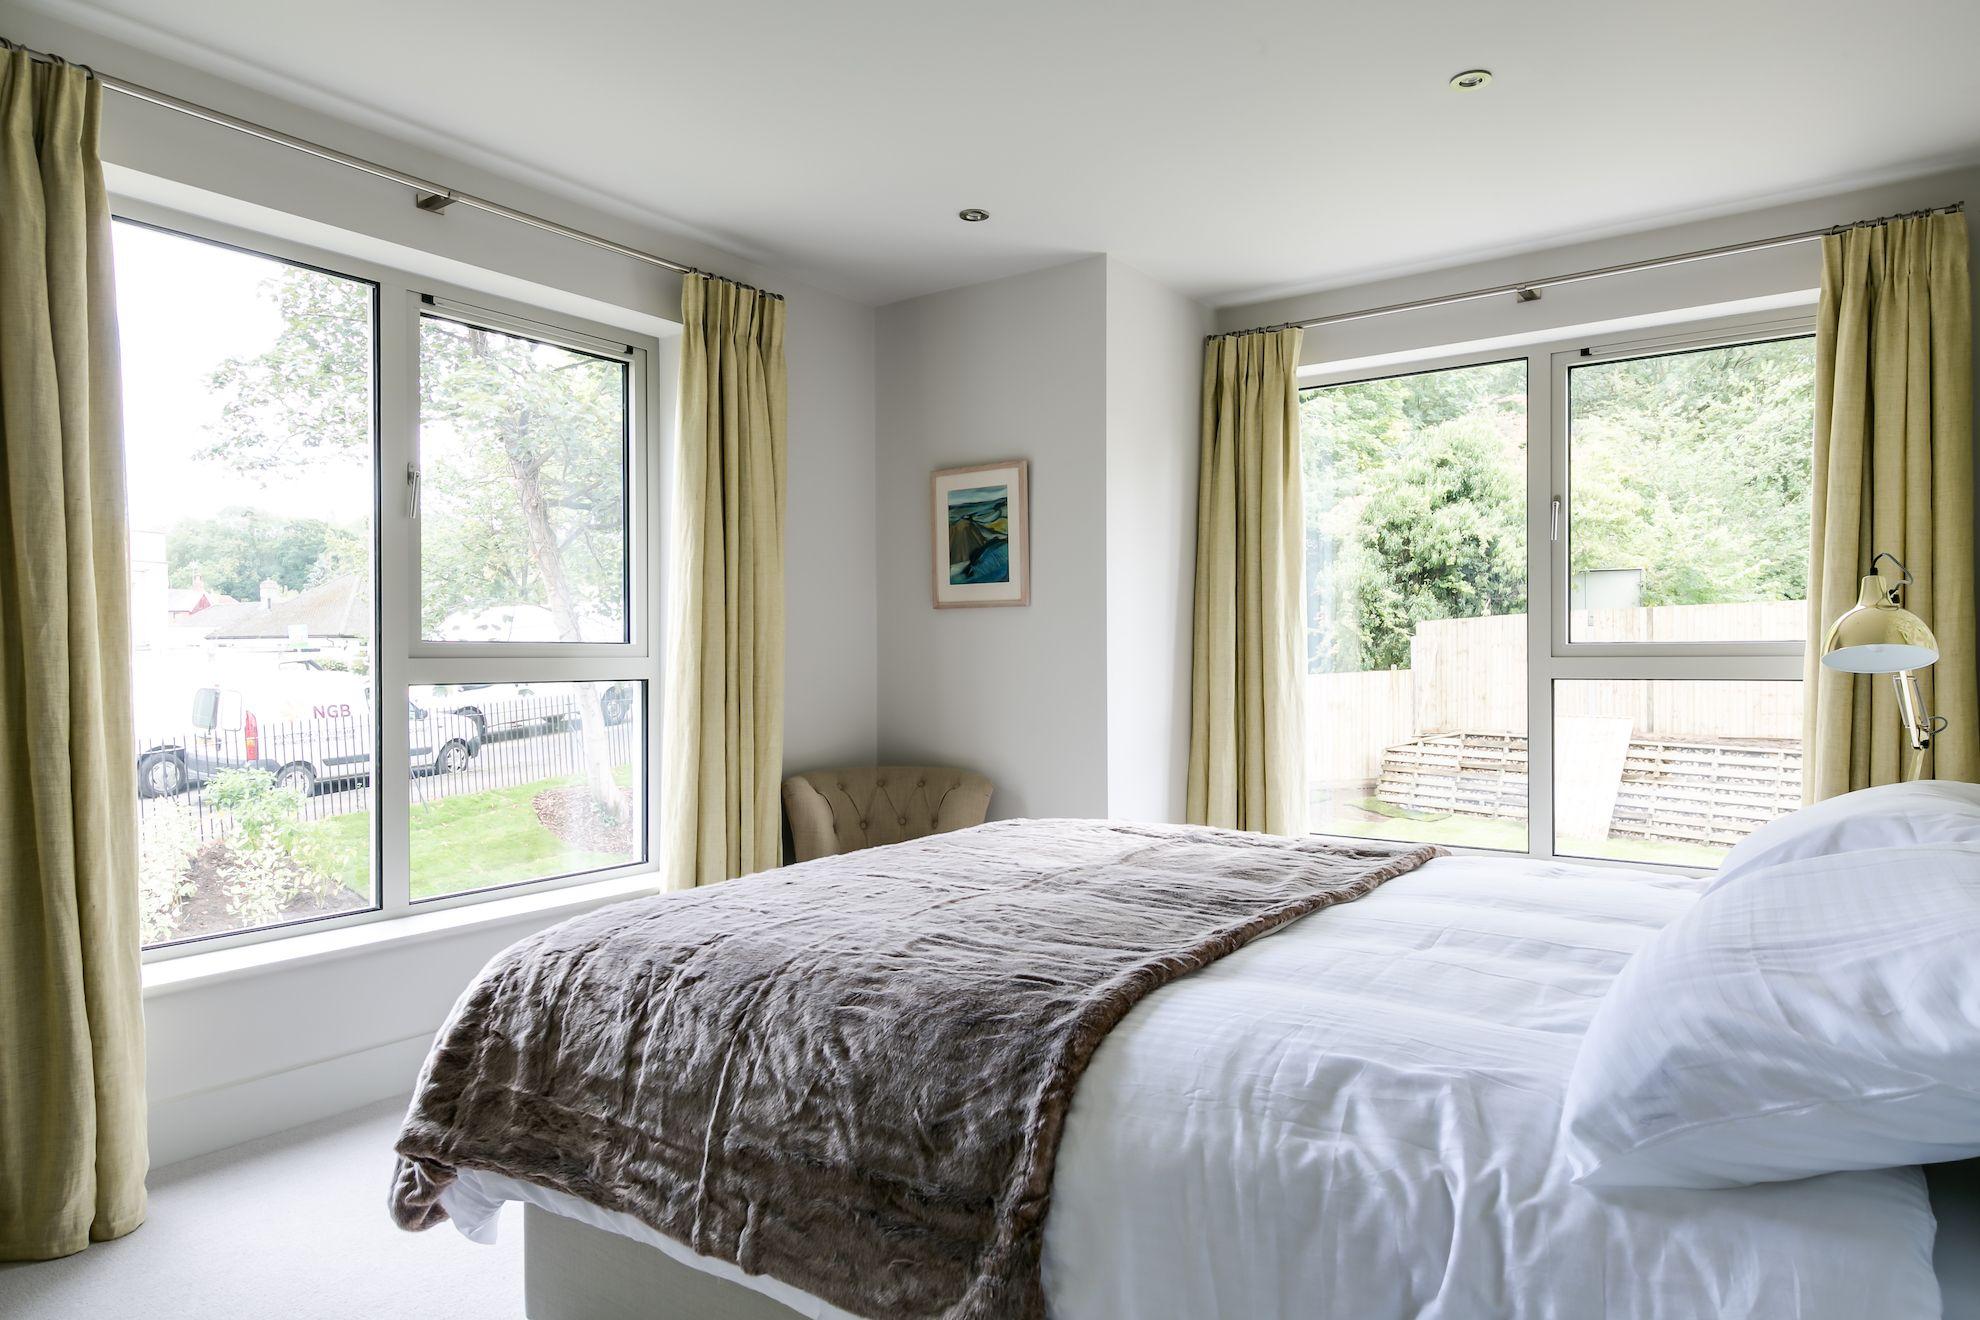 Double aspect windows in bedroom of Plot 1